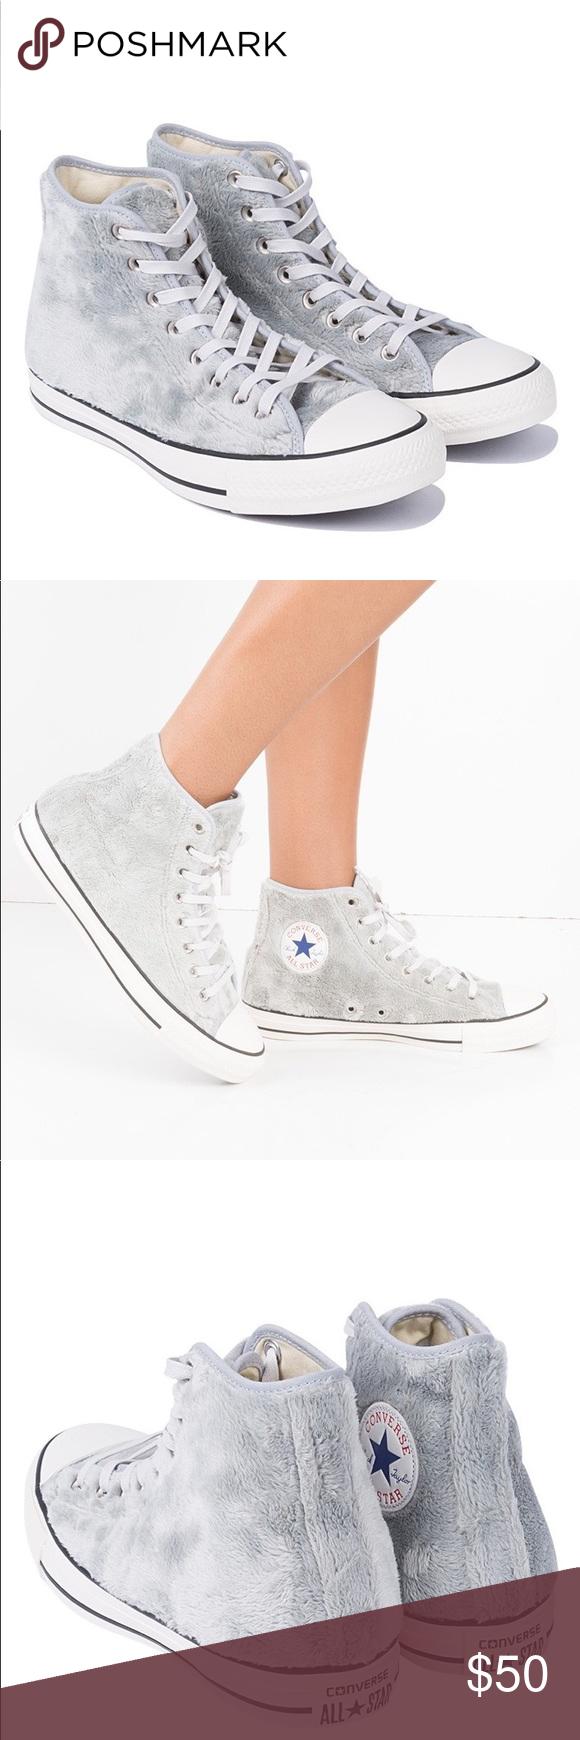 Converse NWOT Fuzzy High Top Sneaker